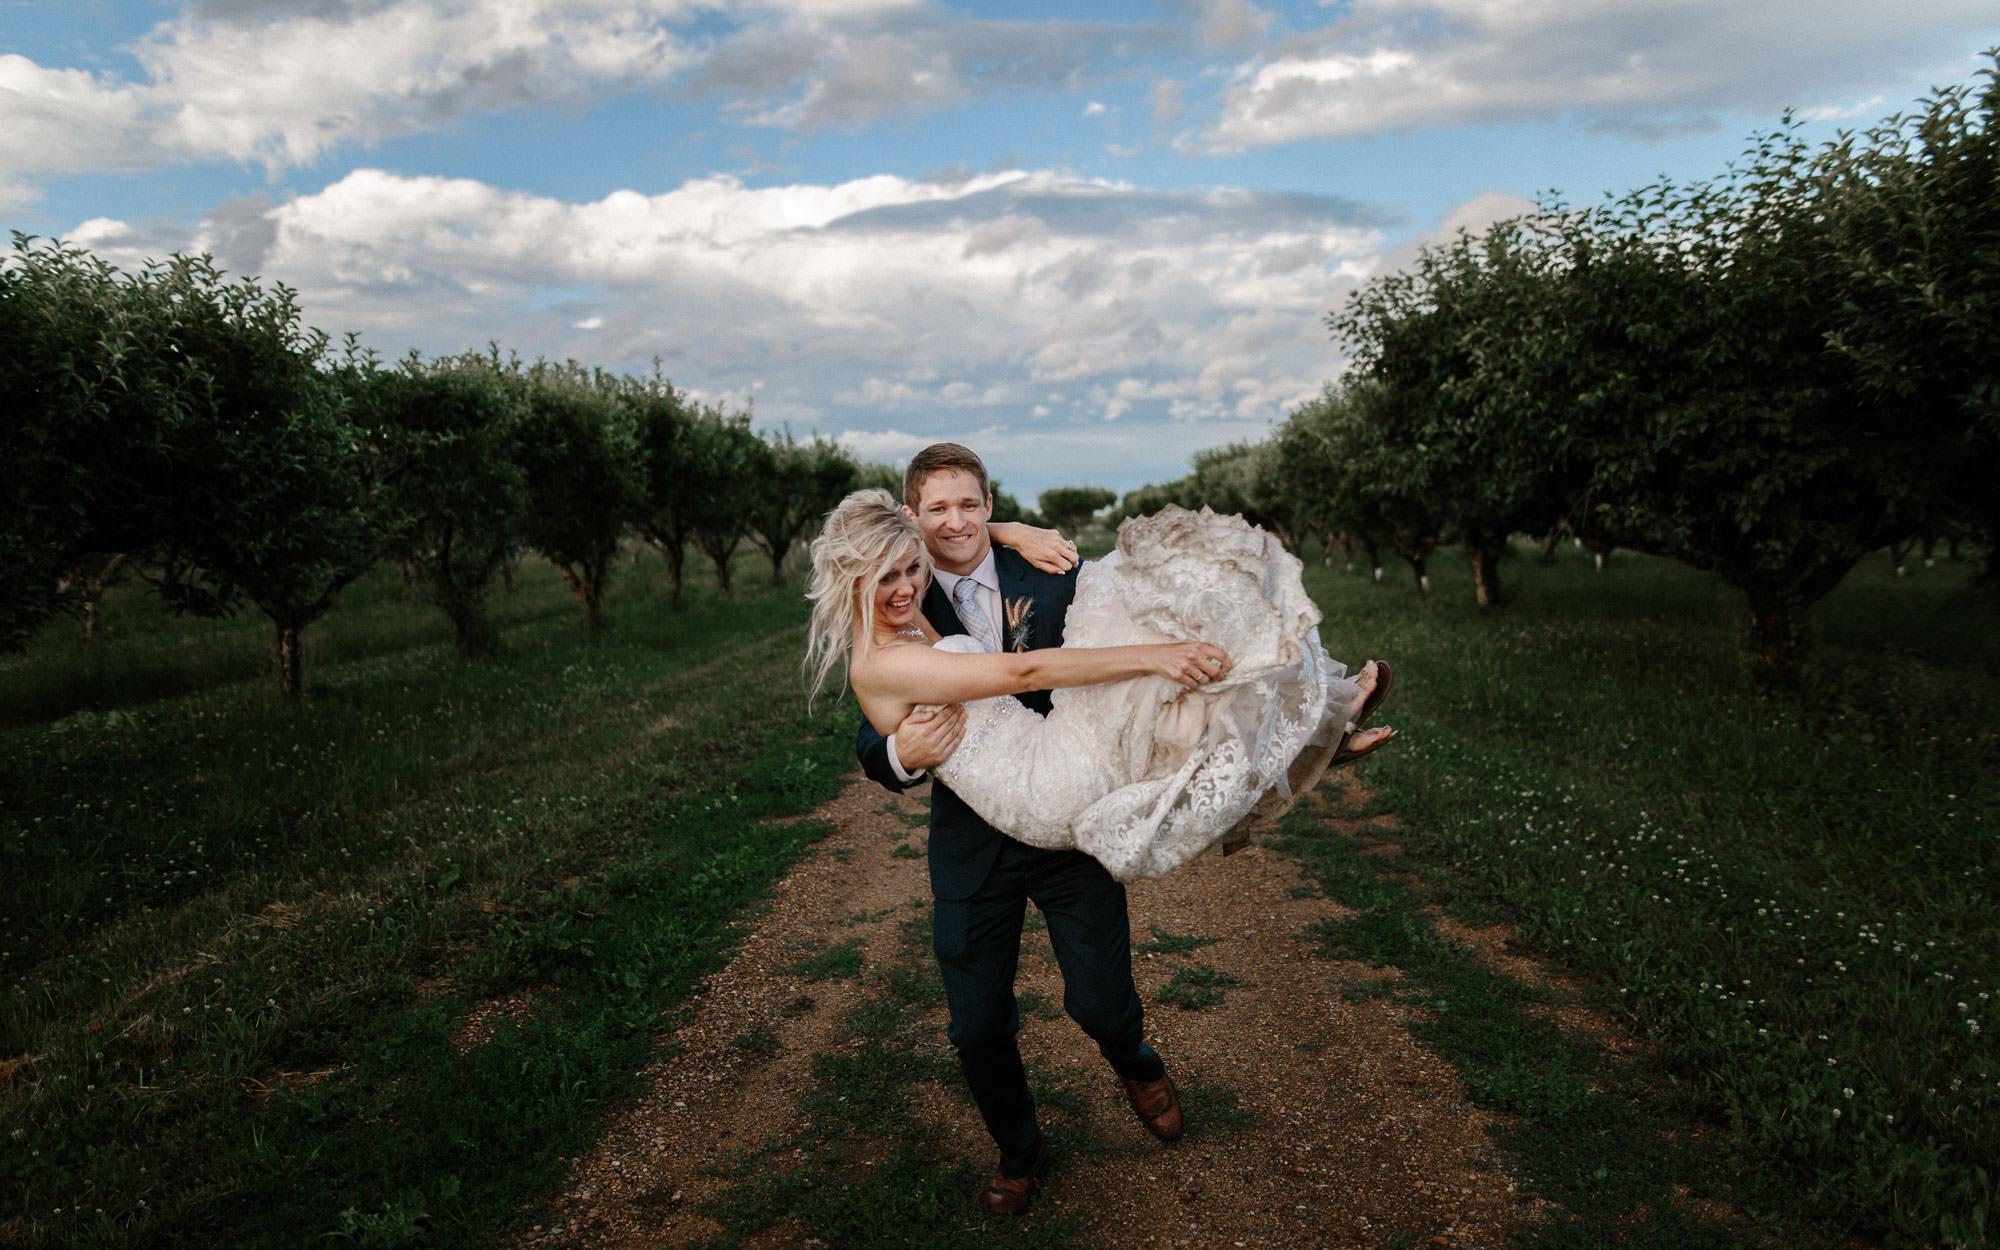 meadow-barn-wedding-sioux-falls-south-dakota-romantic-adventerous-michael-liedtke-photography104.jpg